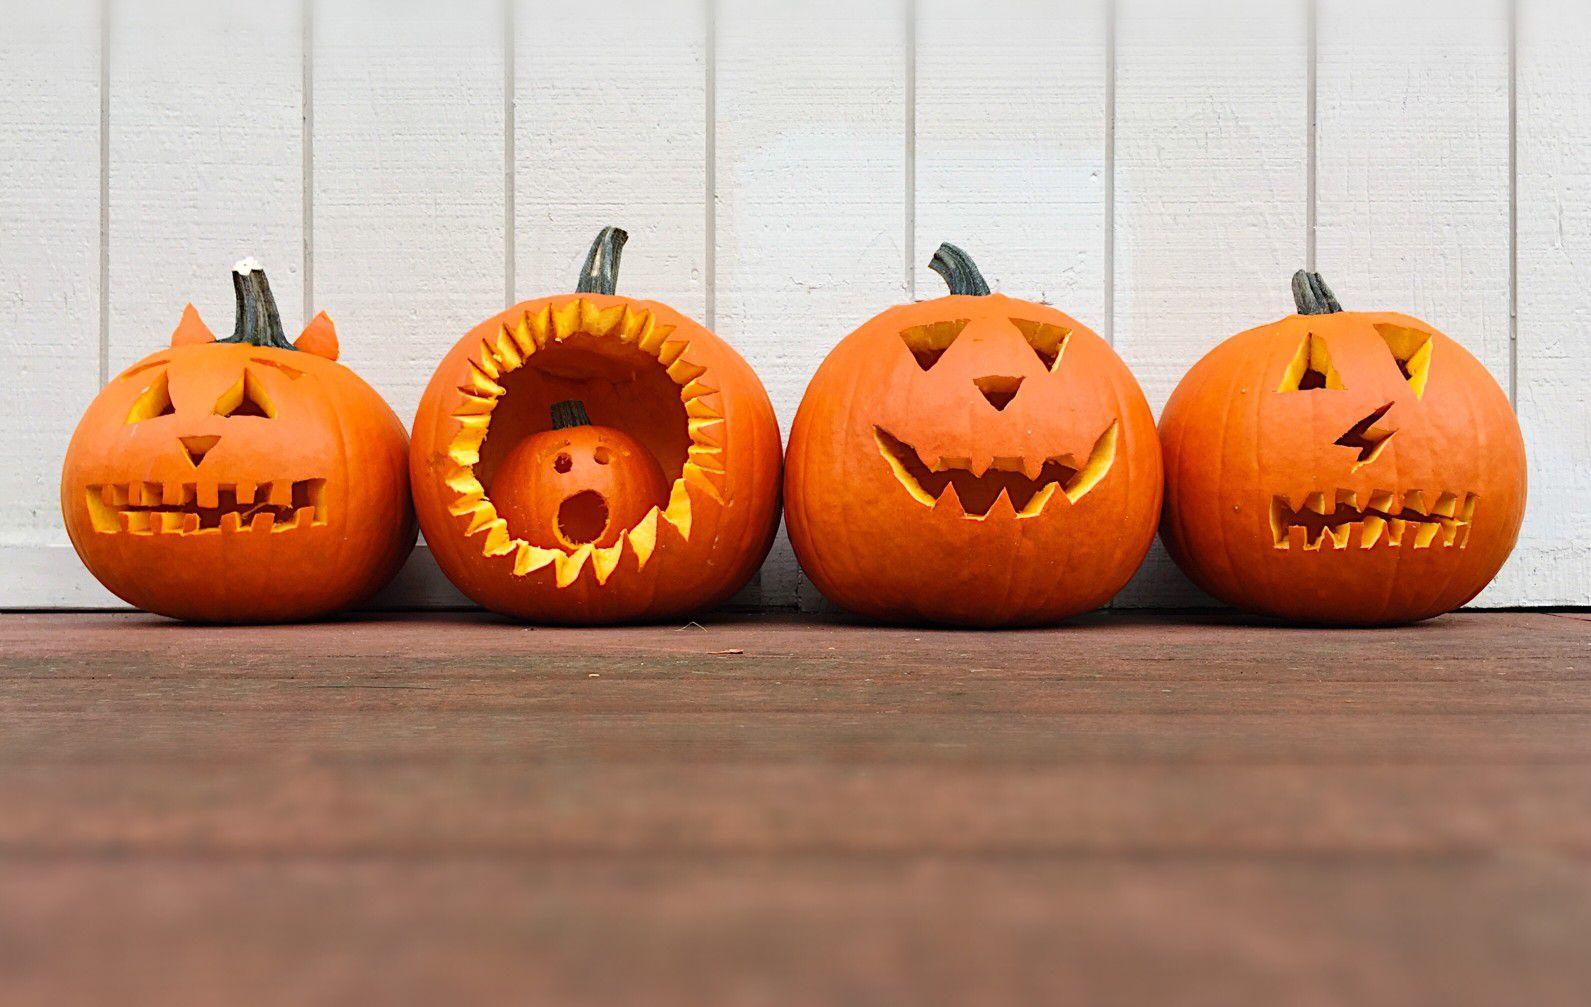 7 Tips To Keep Your Halloween Pumpkin Fresh